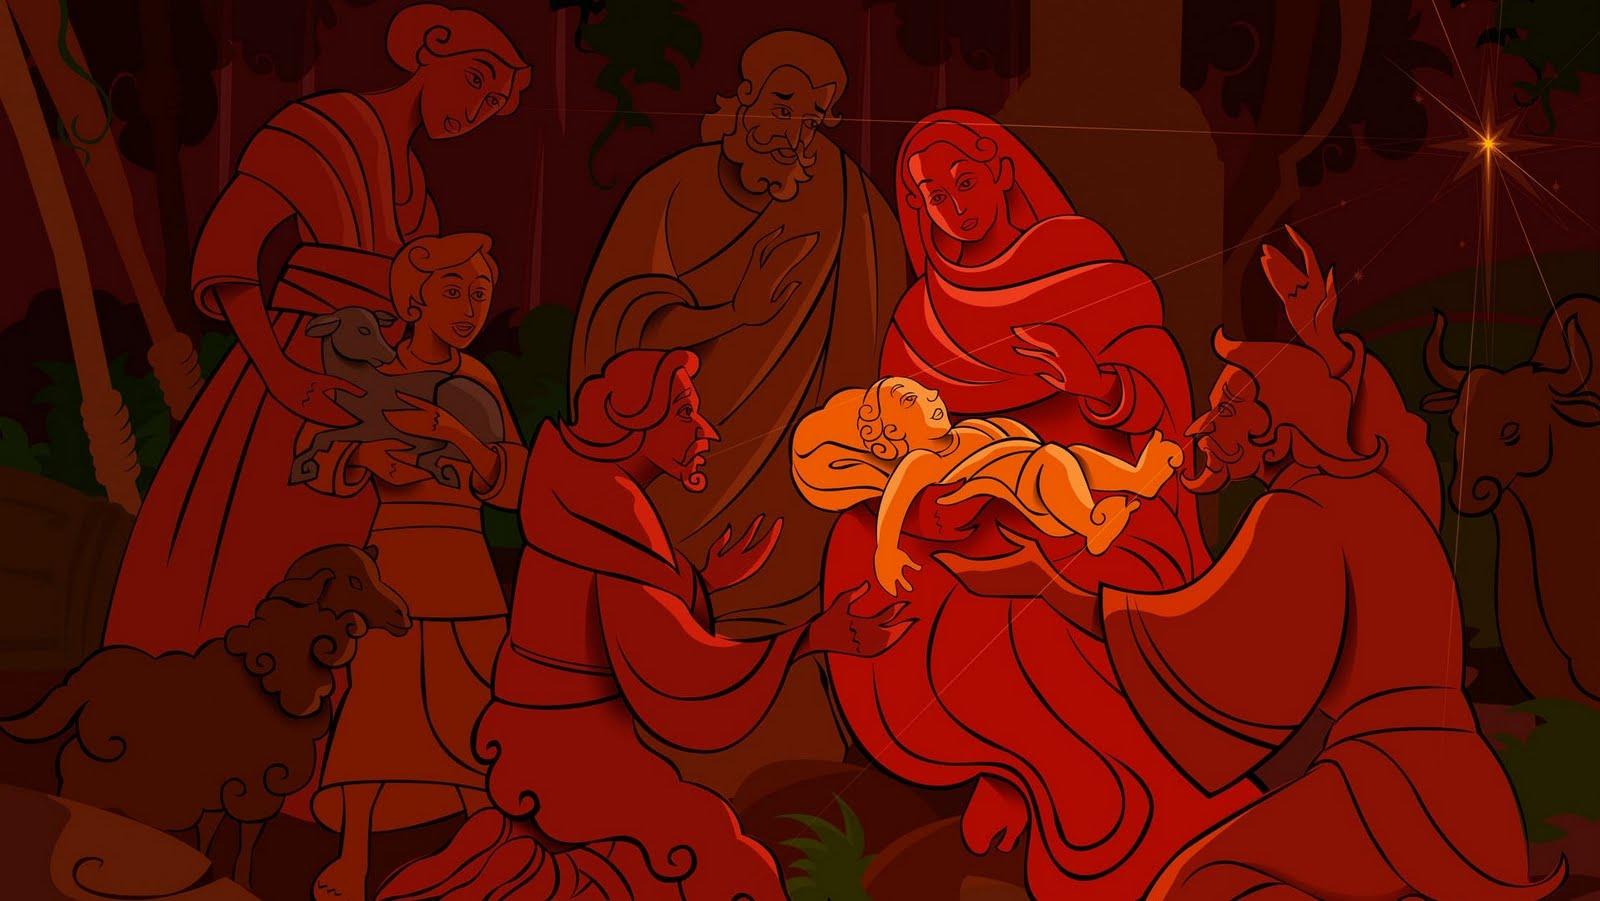 Birth of Christ Celebrations Wallpaper (1920x1200) Black  - birth of christ celebrations wallpapers